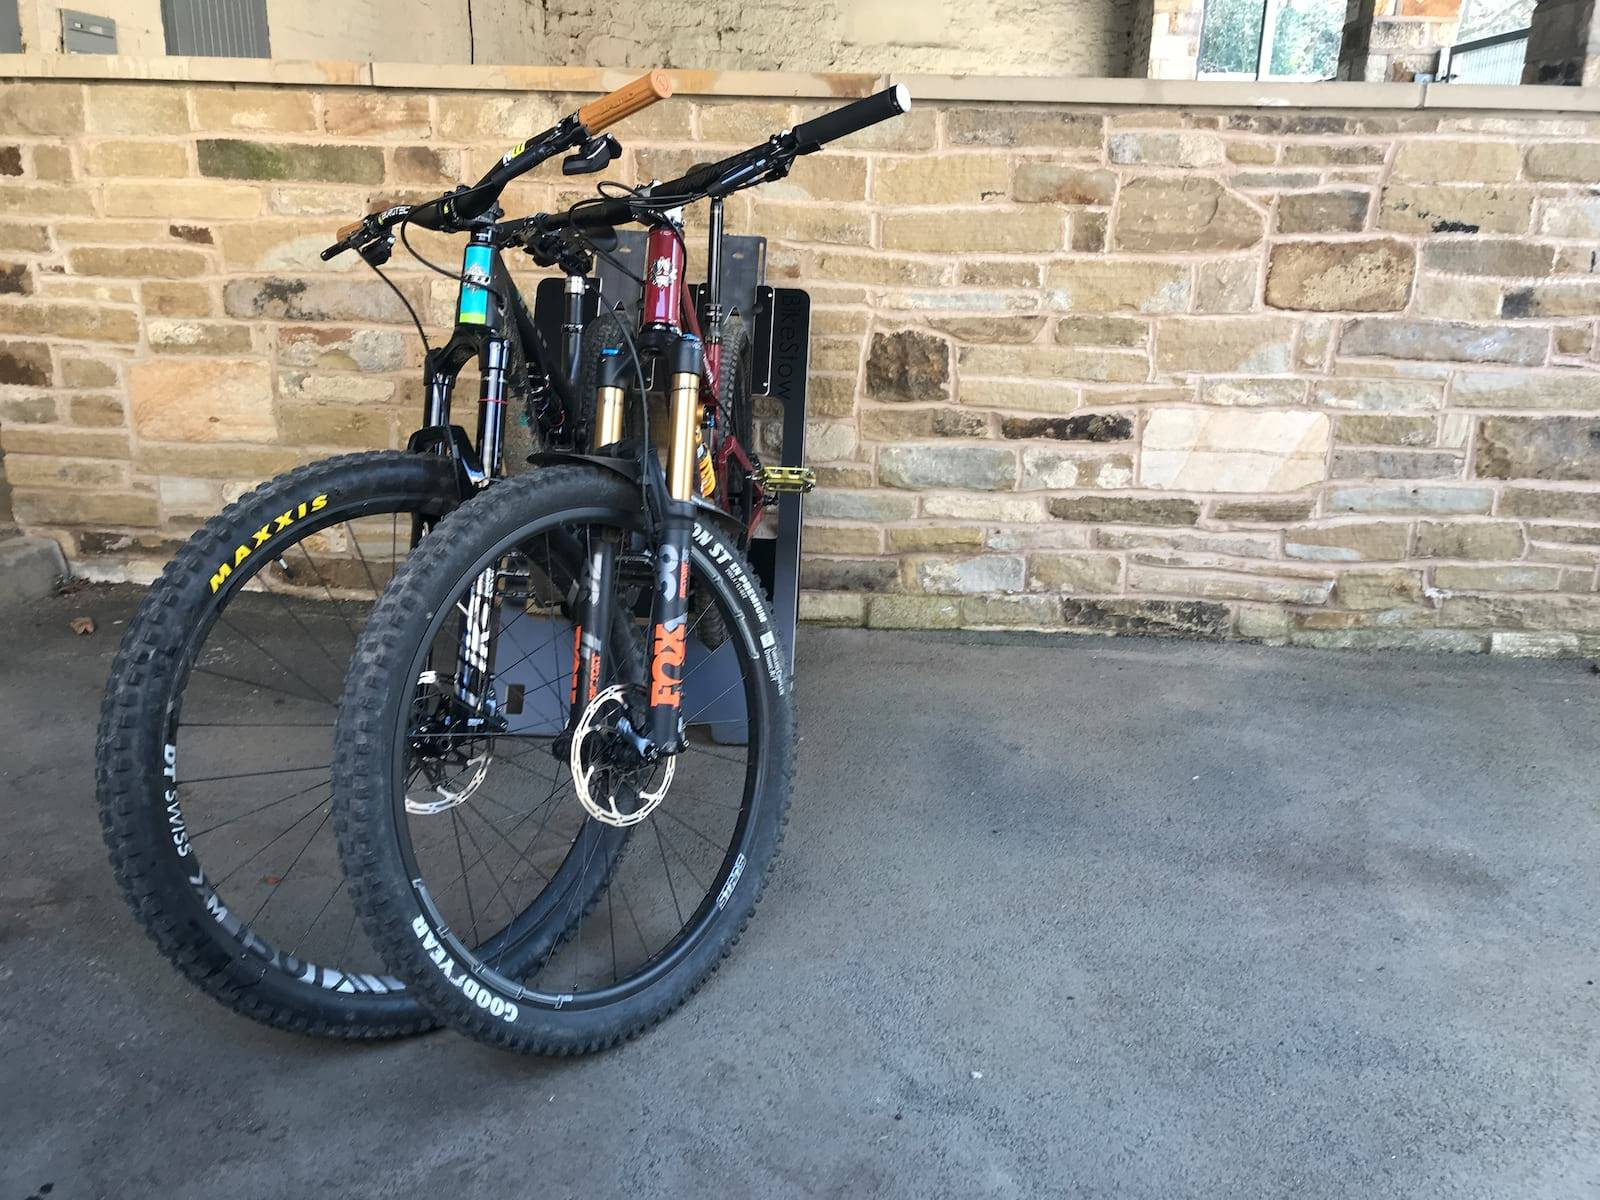 stw 2019 04 17 Bikestow6